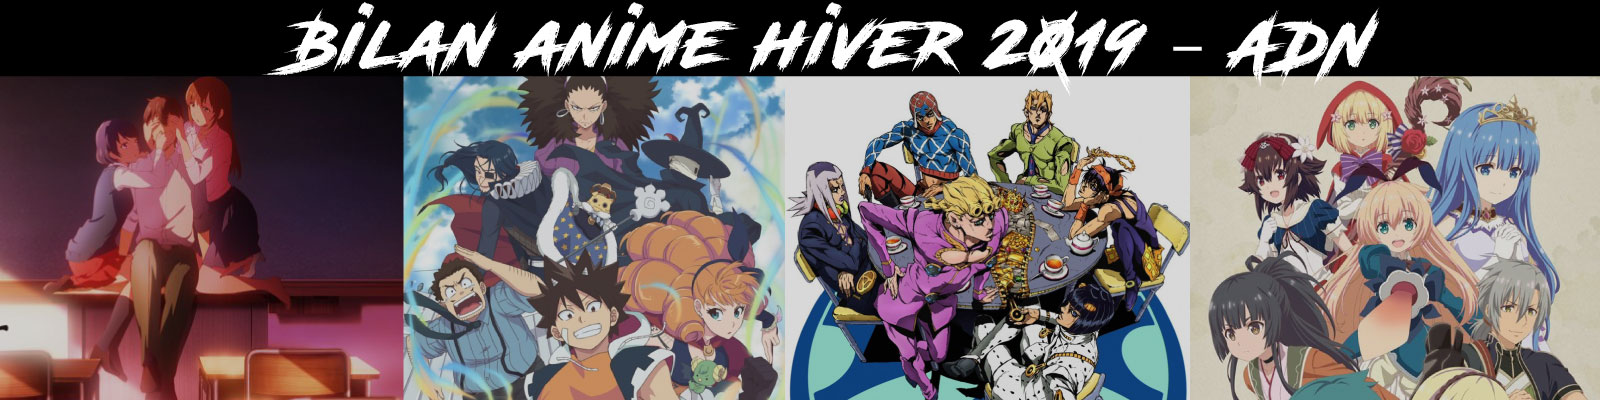 Bilan-anime-HIVER-2019-ADN